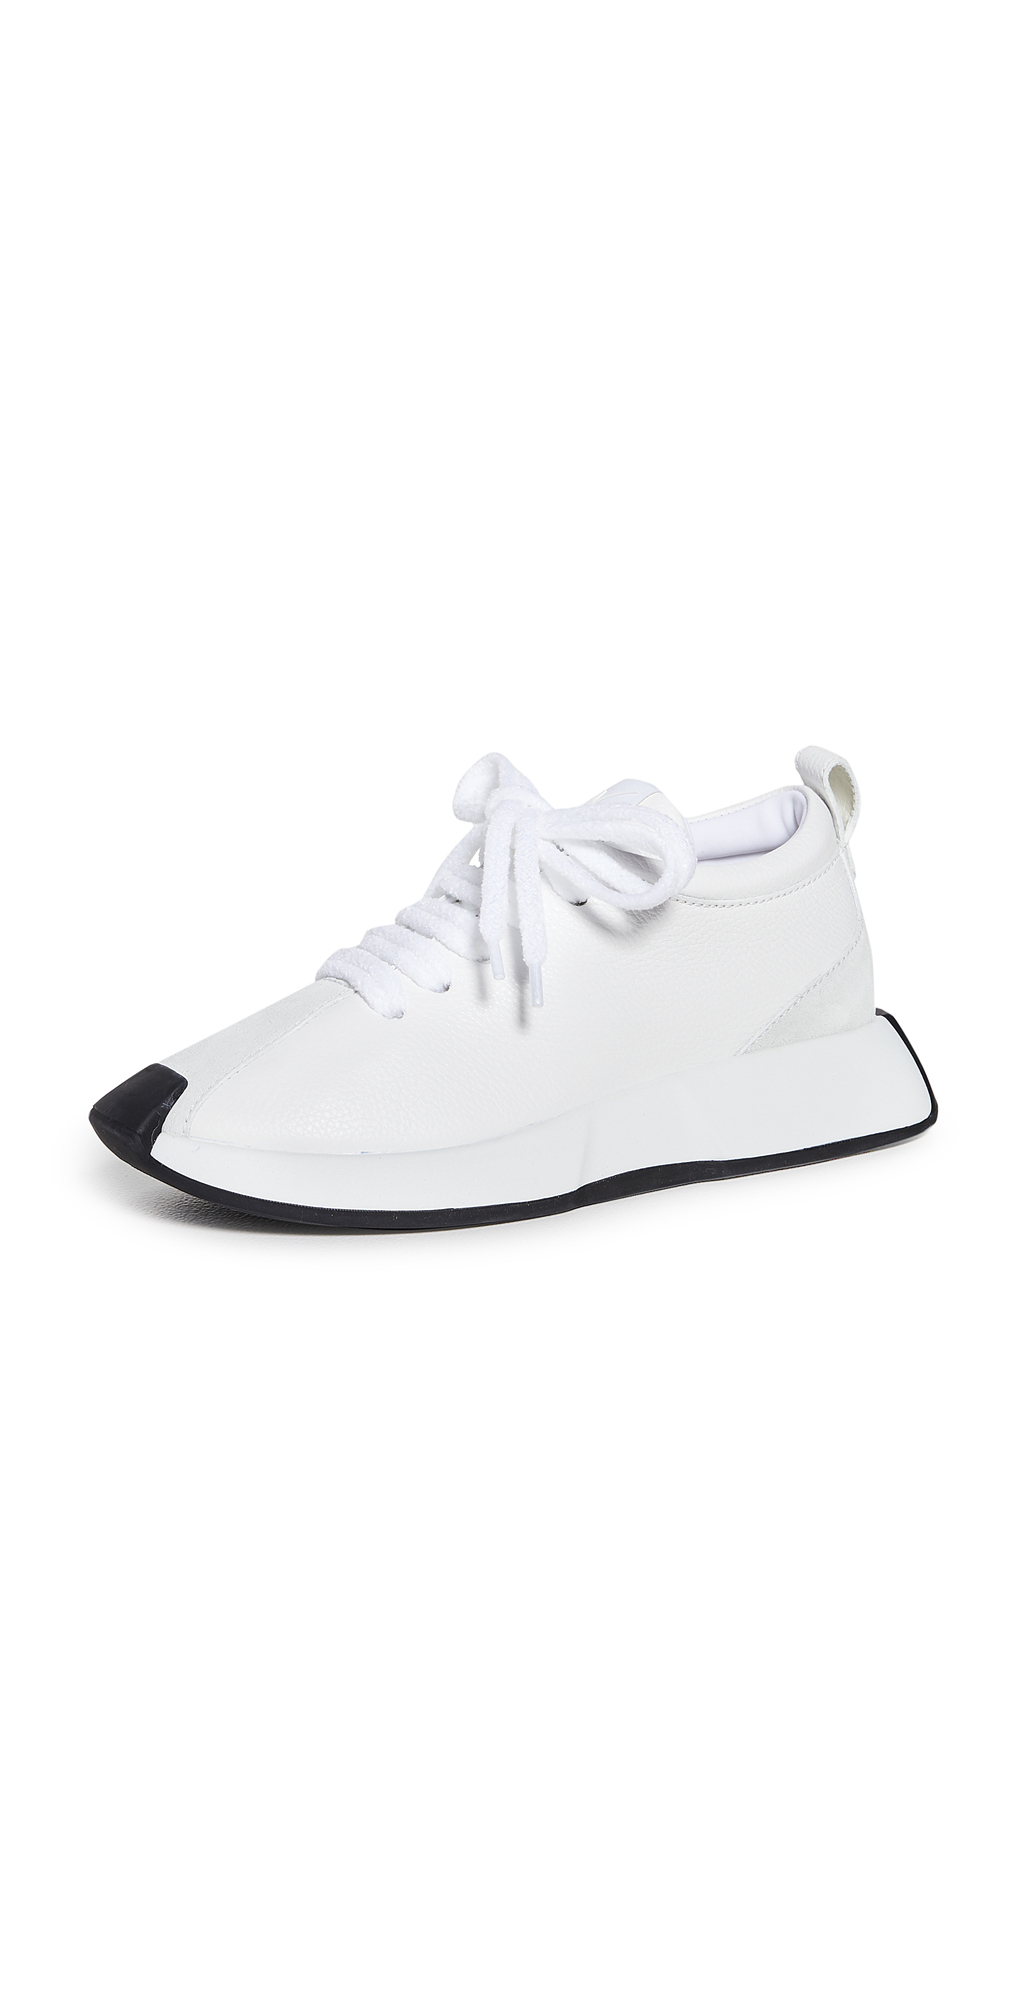 Giuseppe Zanotti Arena Sneakers